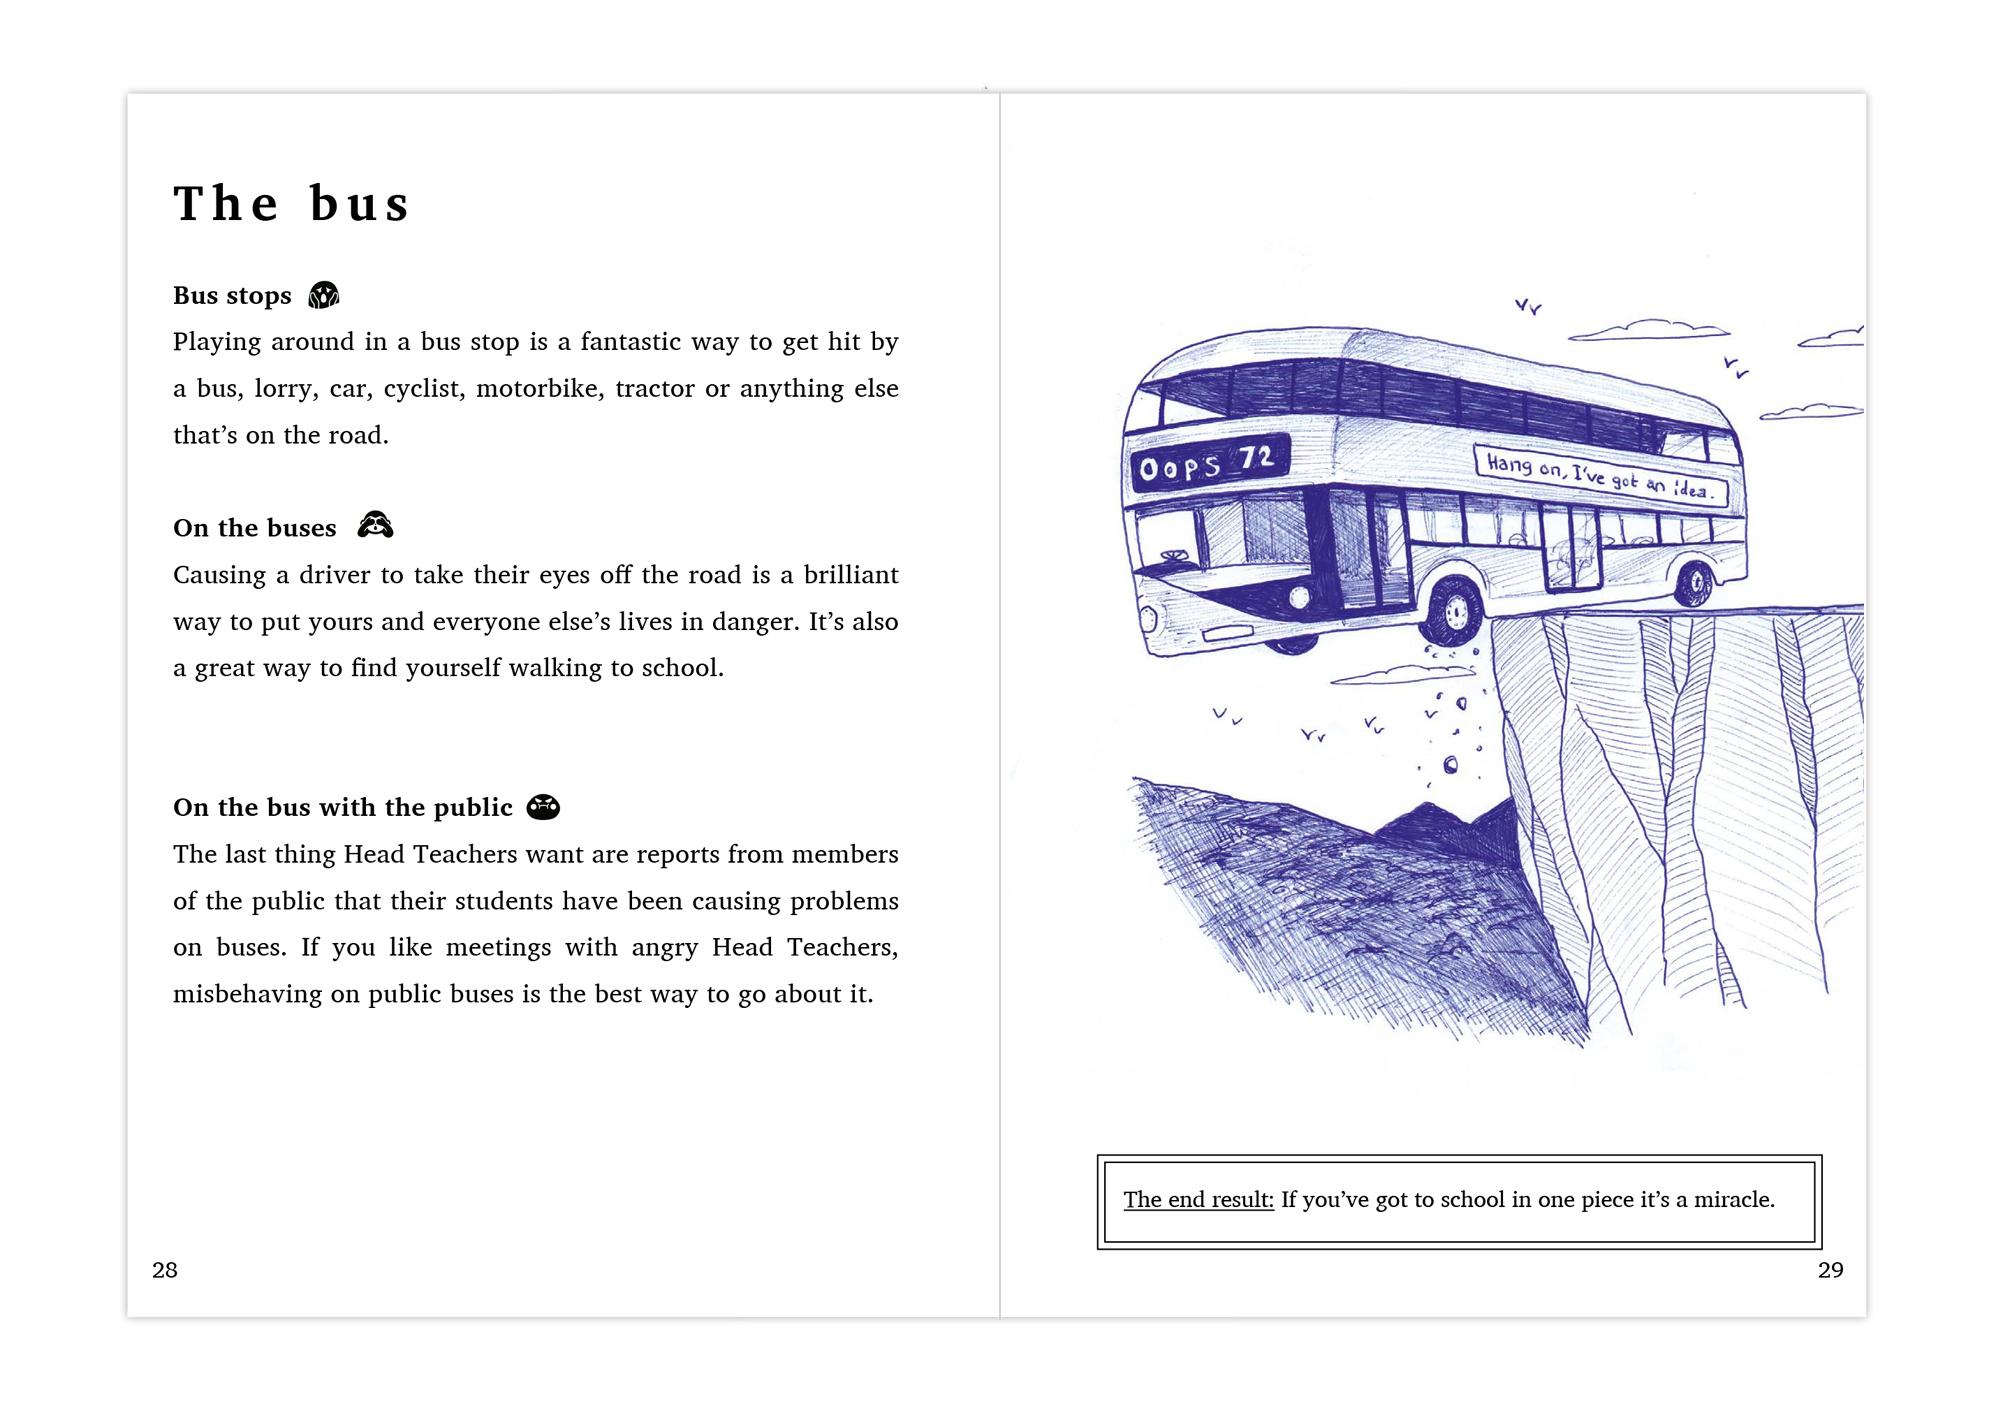 DG-spread-the bus.jpg